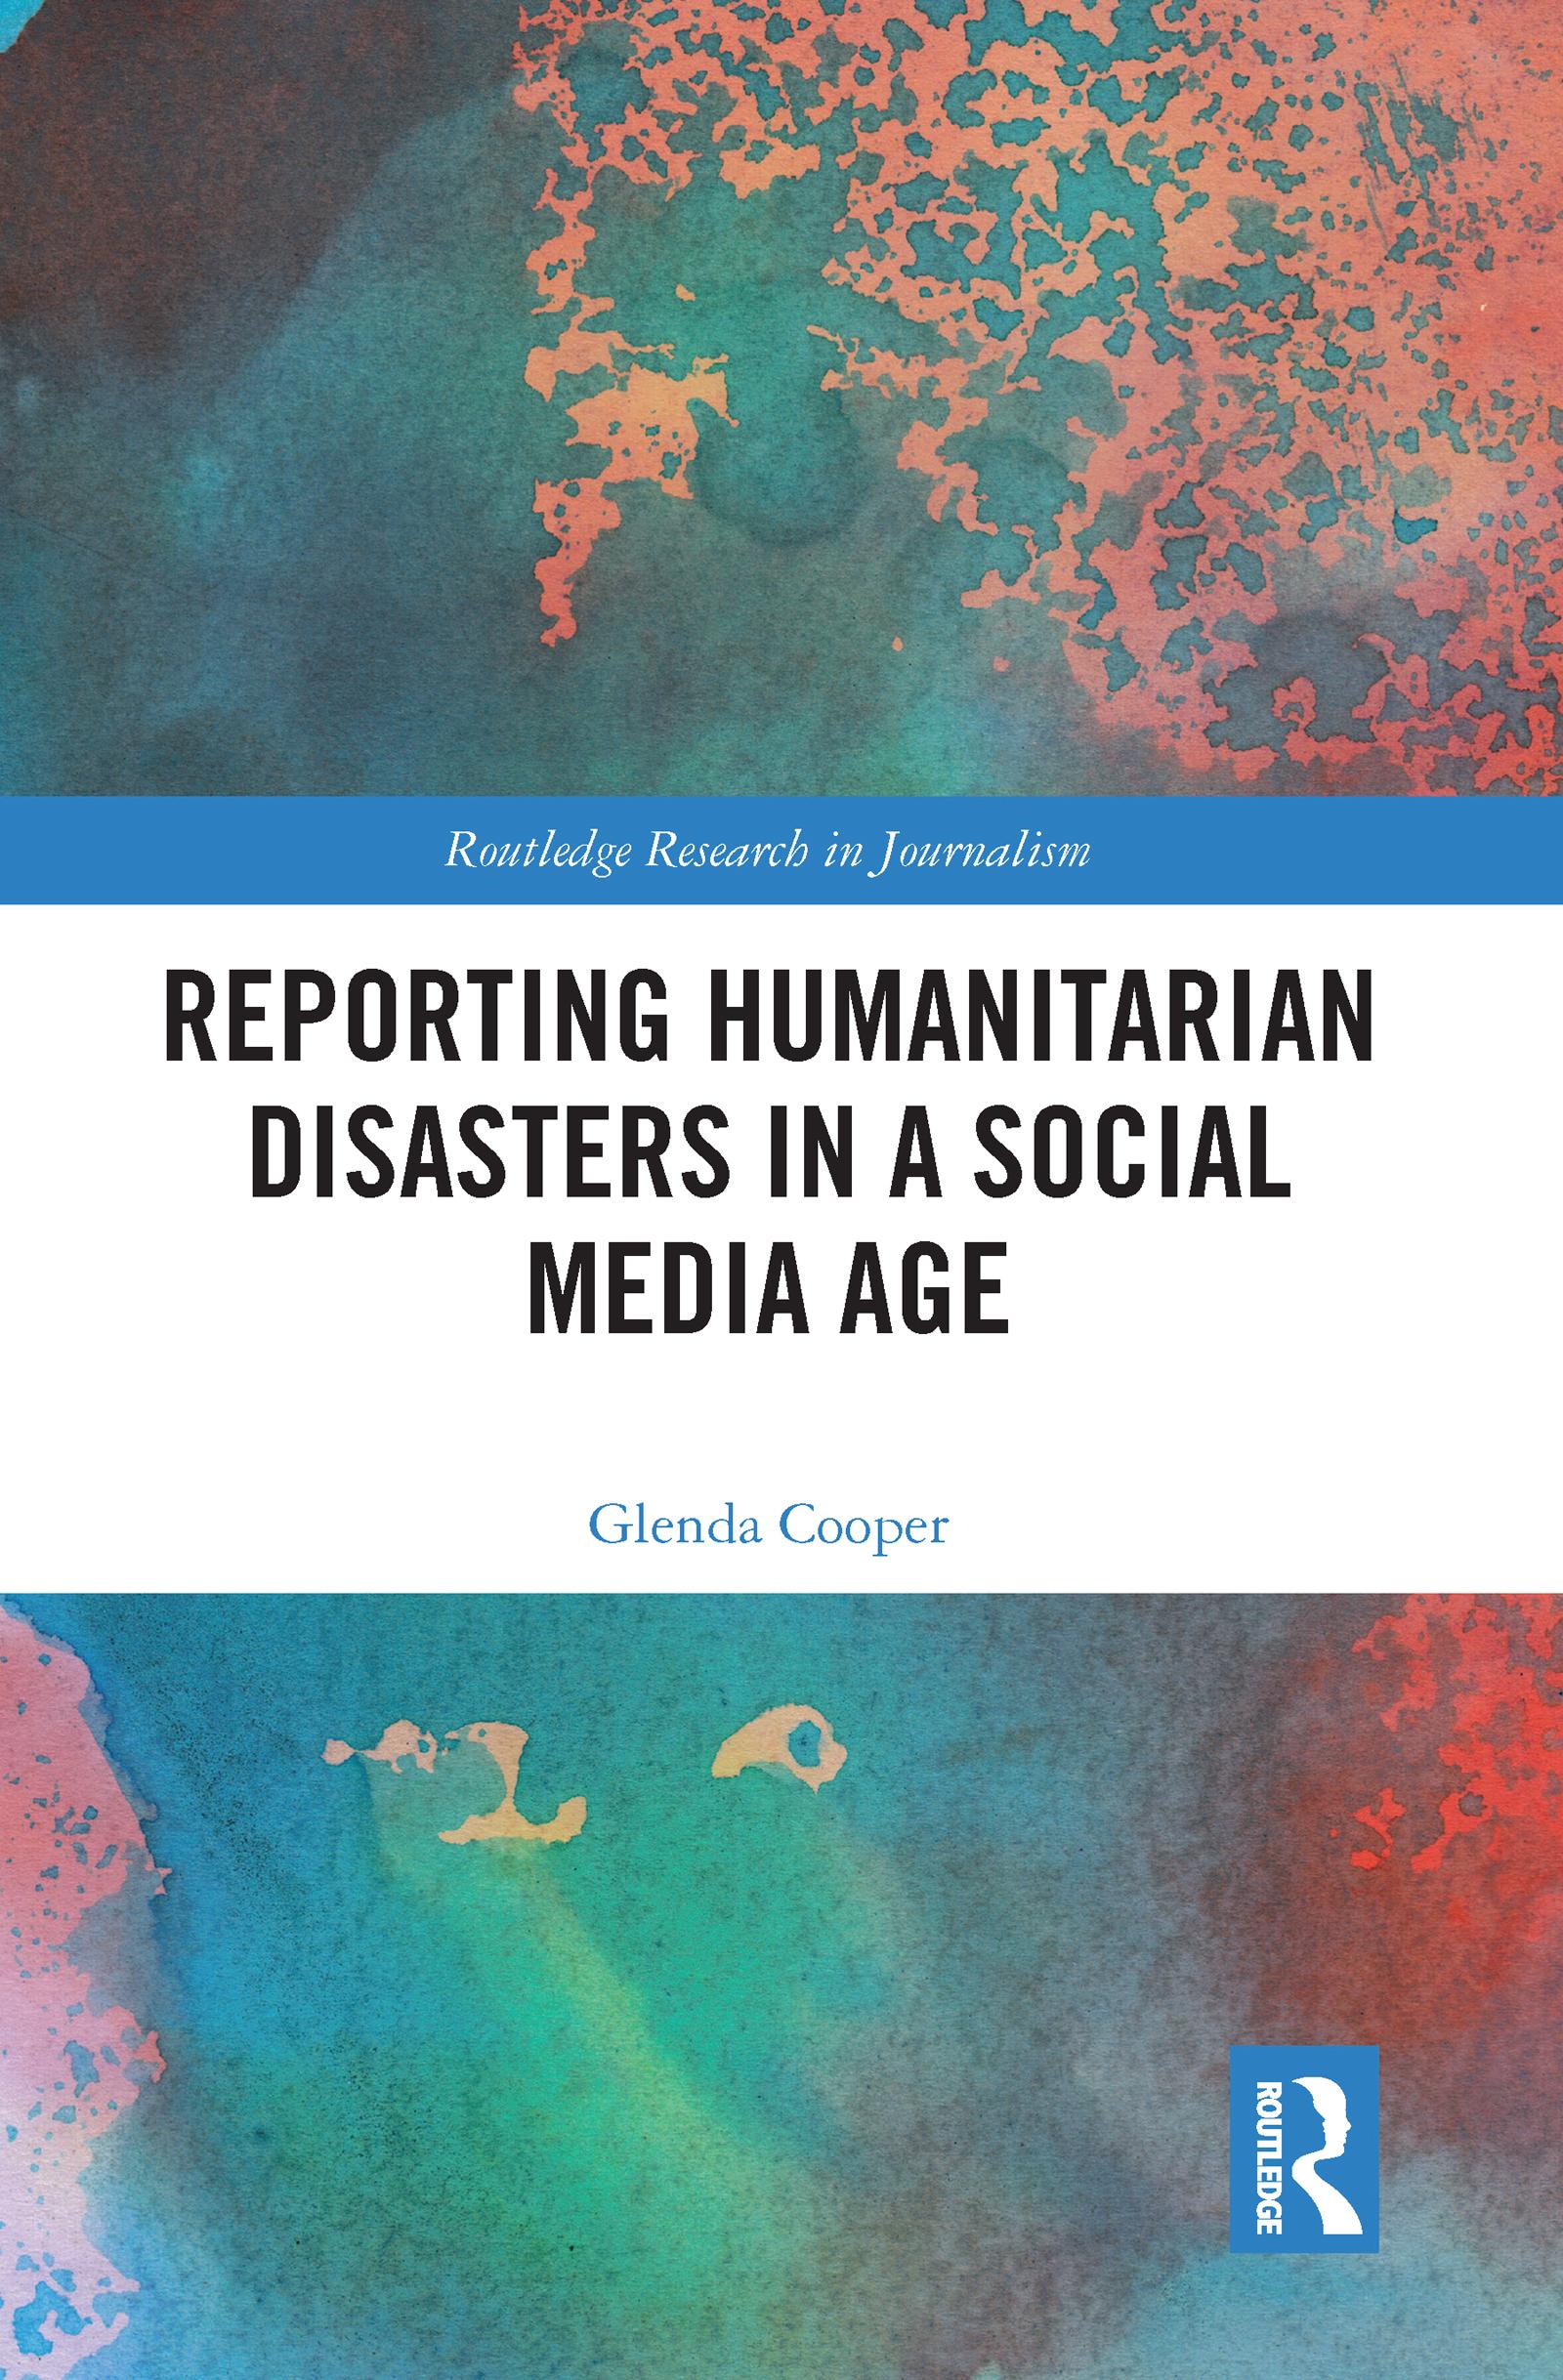 Reporting Humanitarian Disasters in a Social Media Age